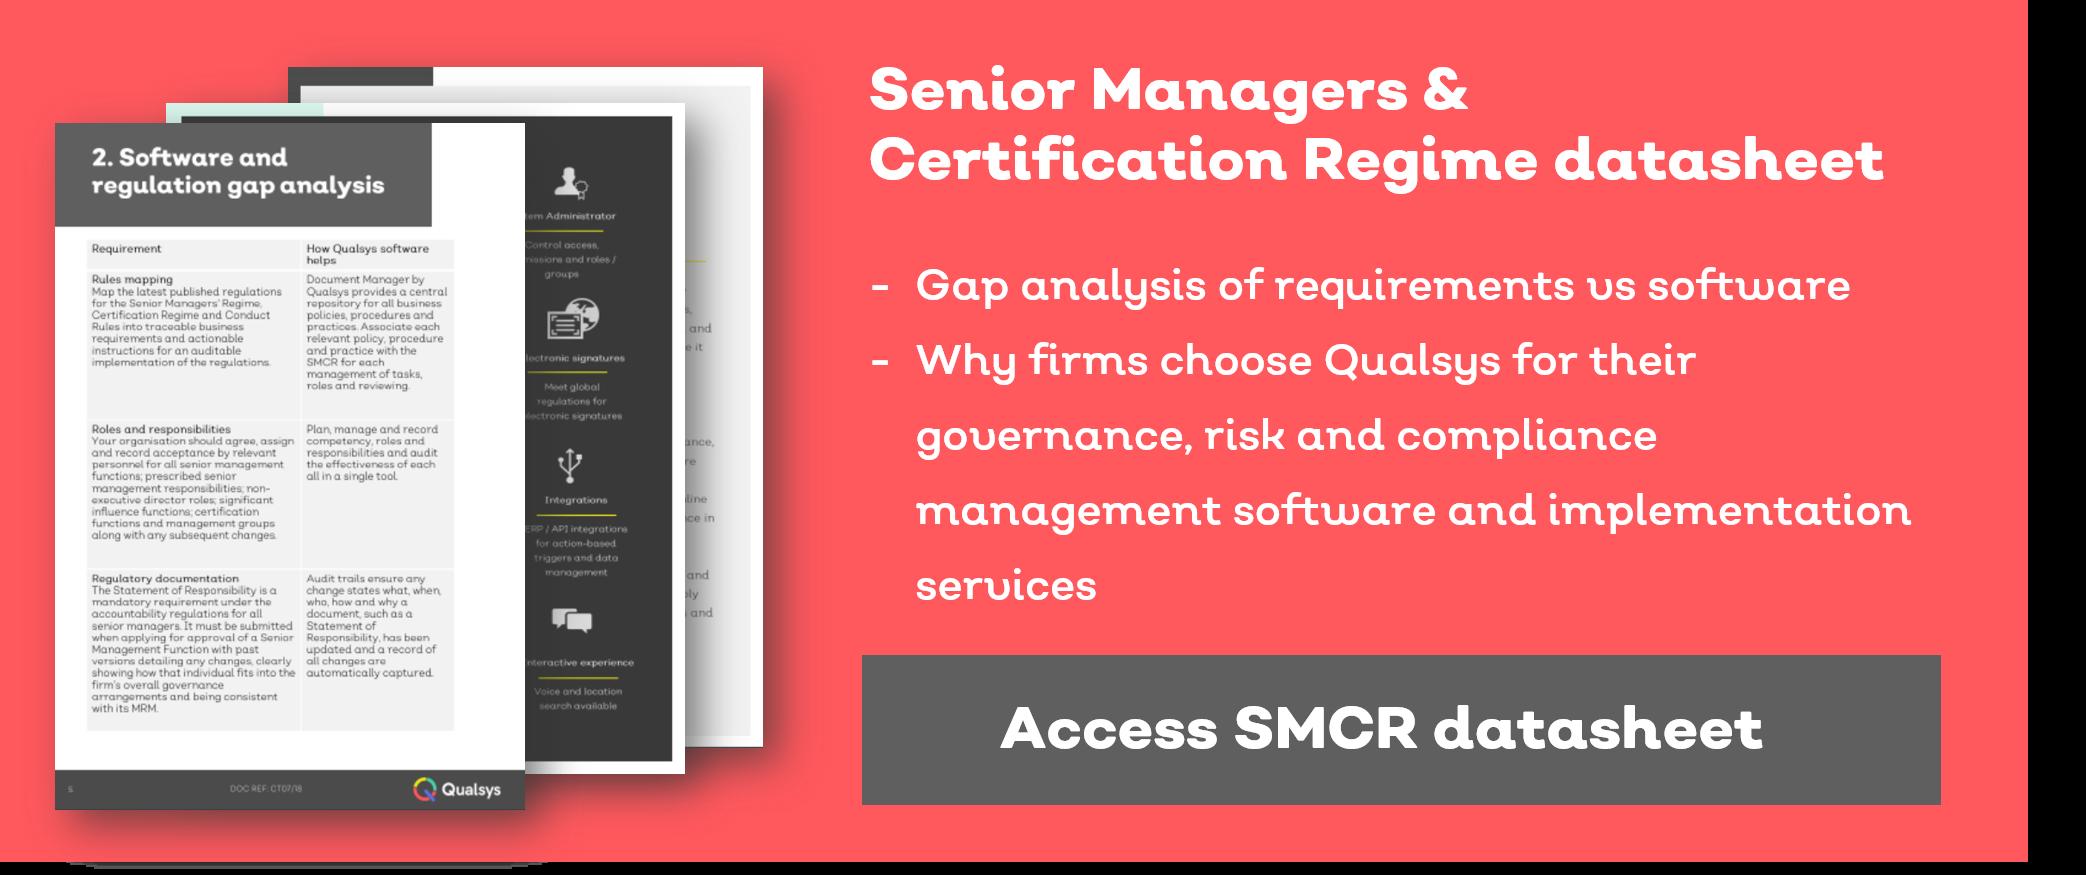 SMCR - datasheet